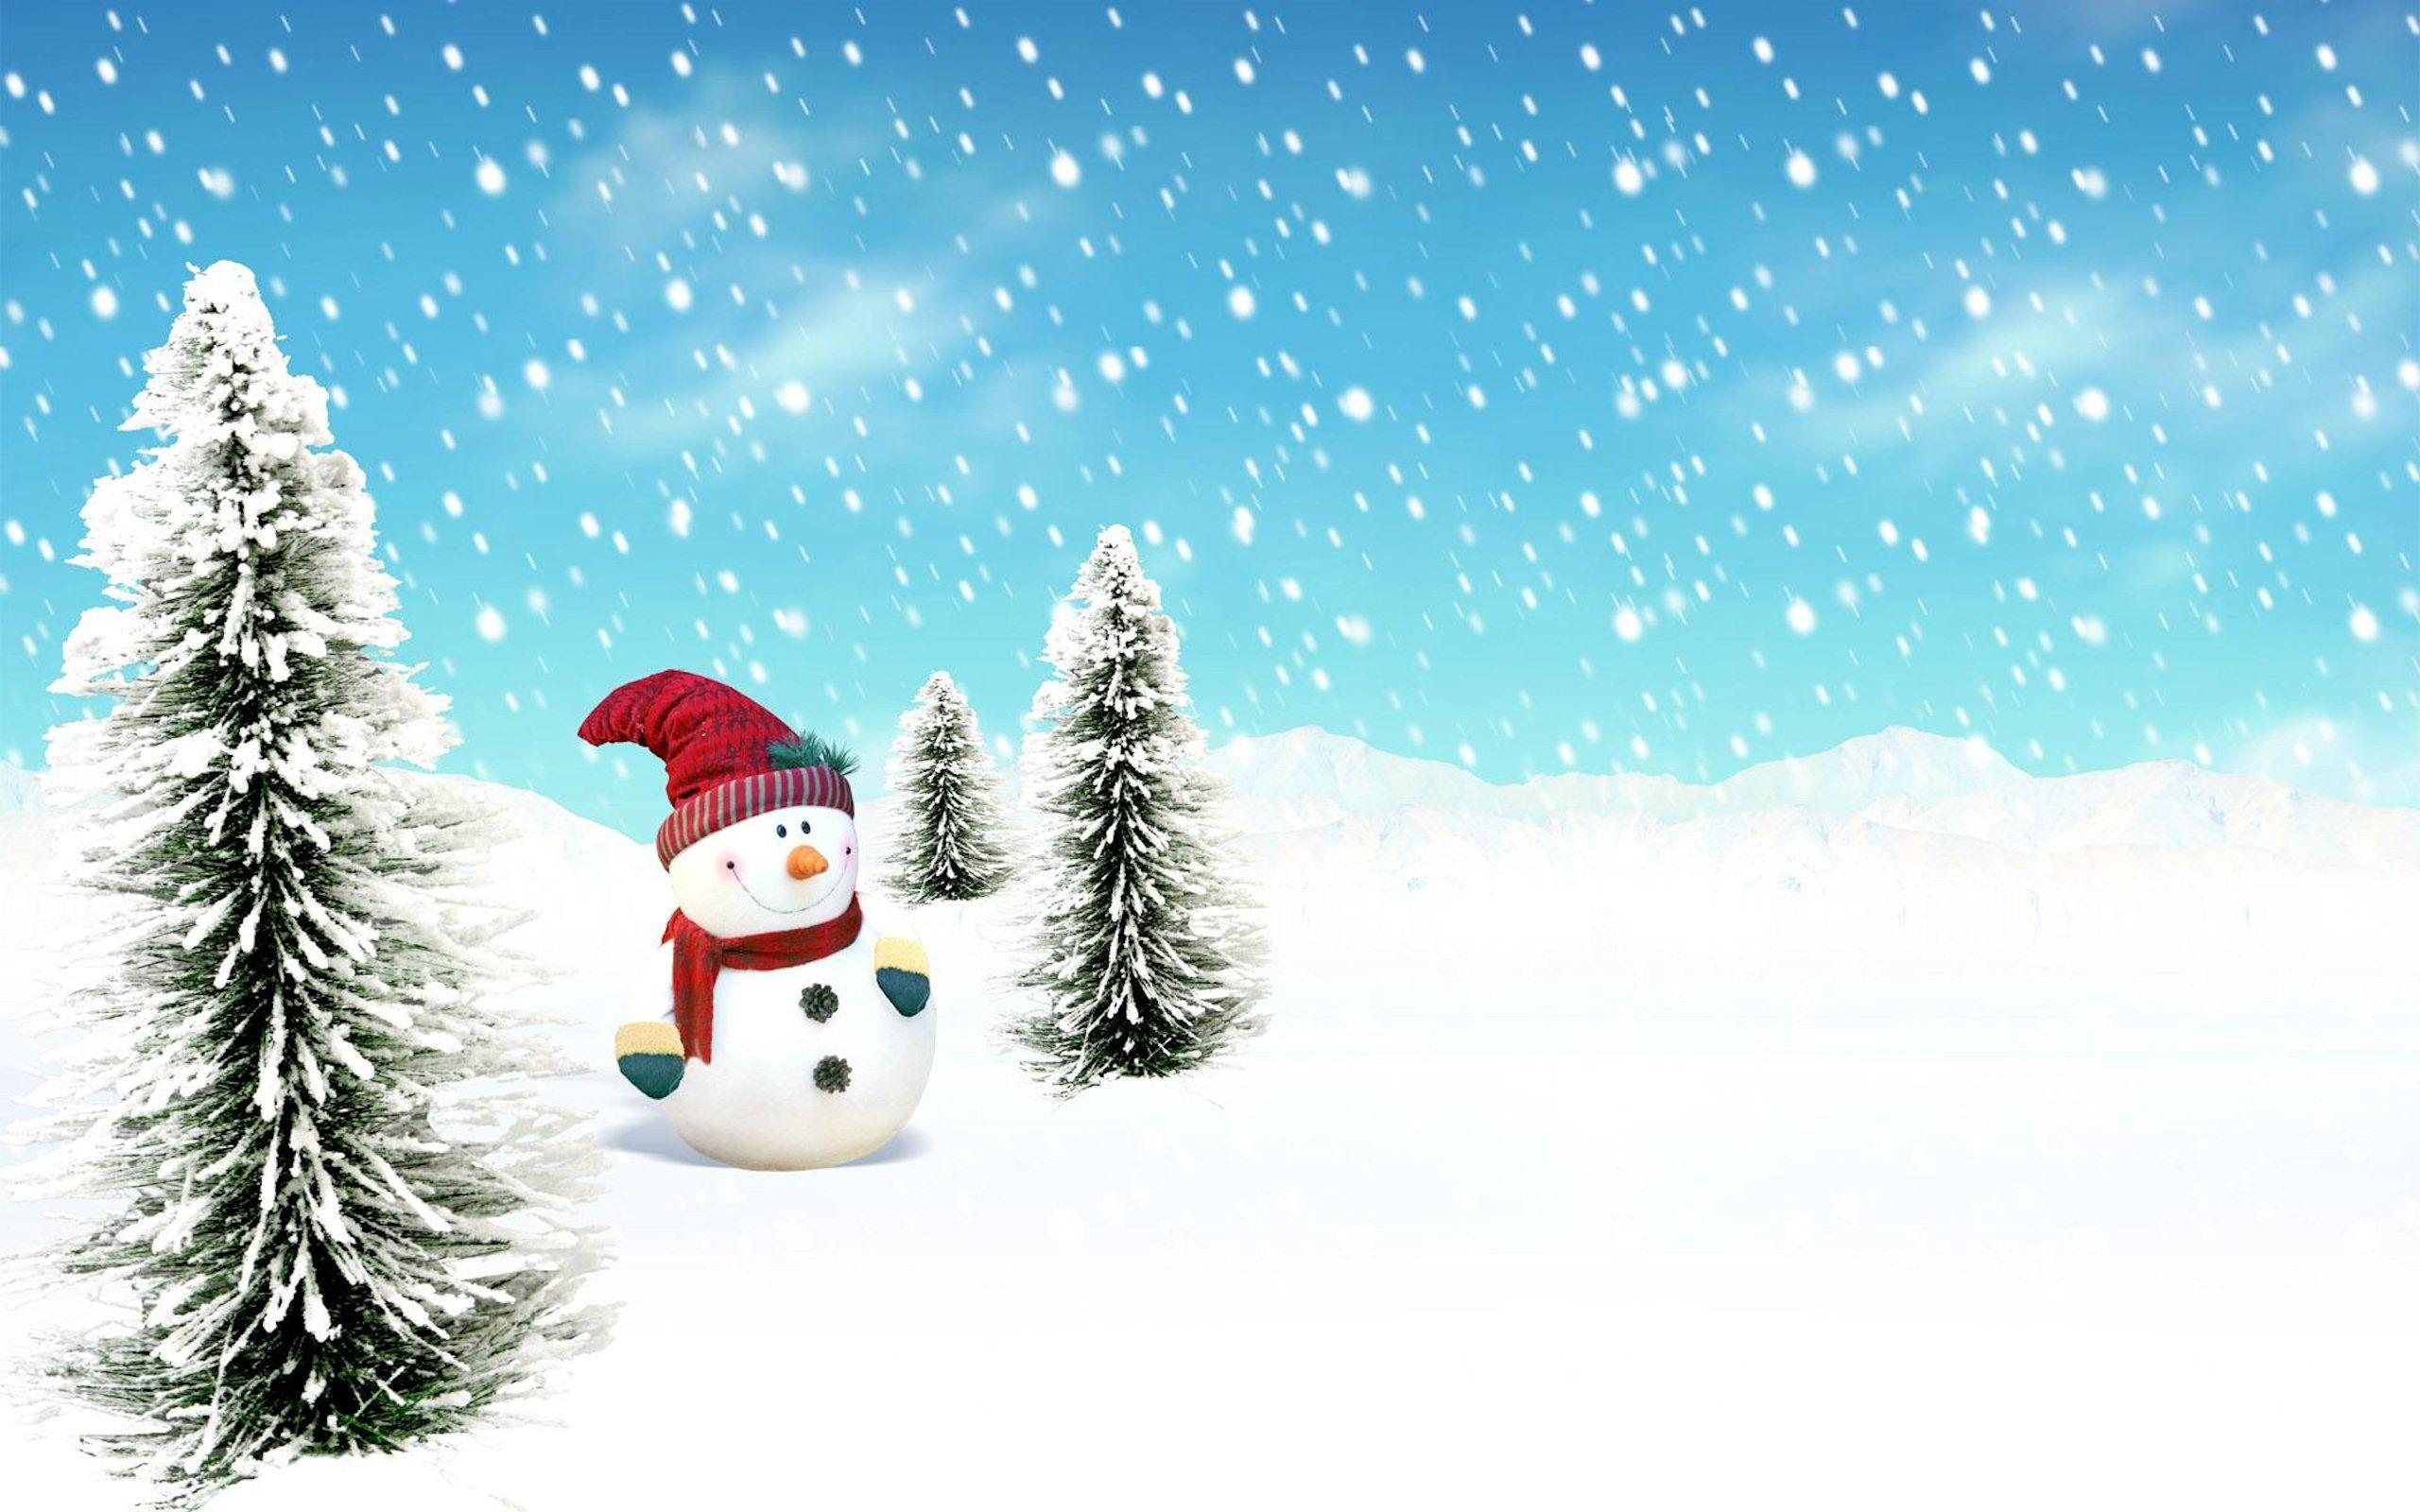 winter landscape vector wallpaper pack download free vector art